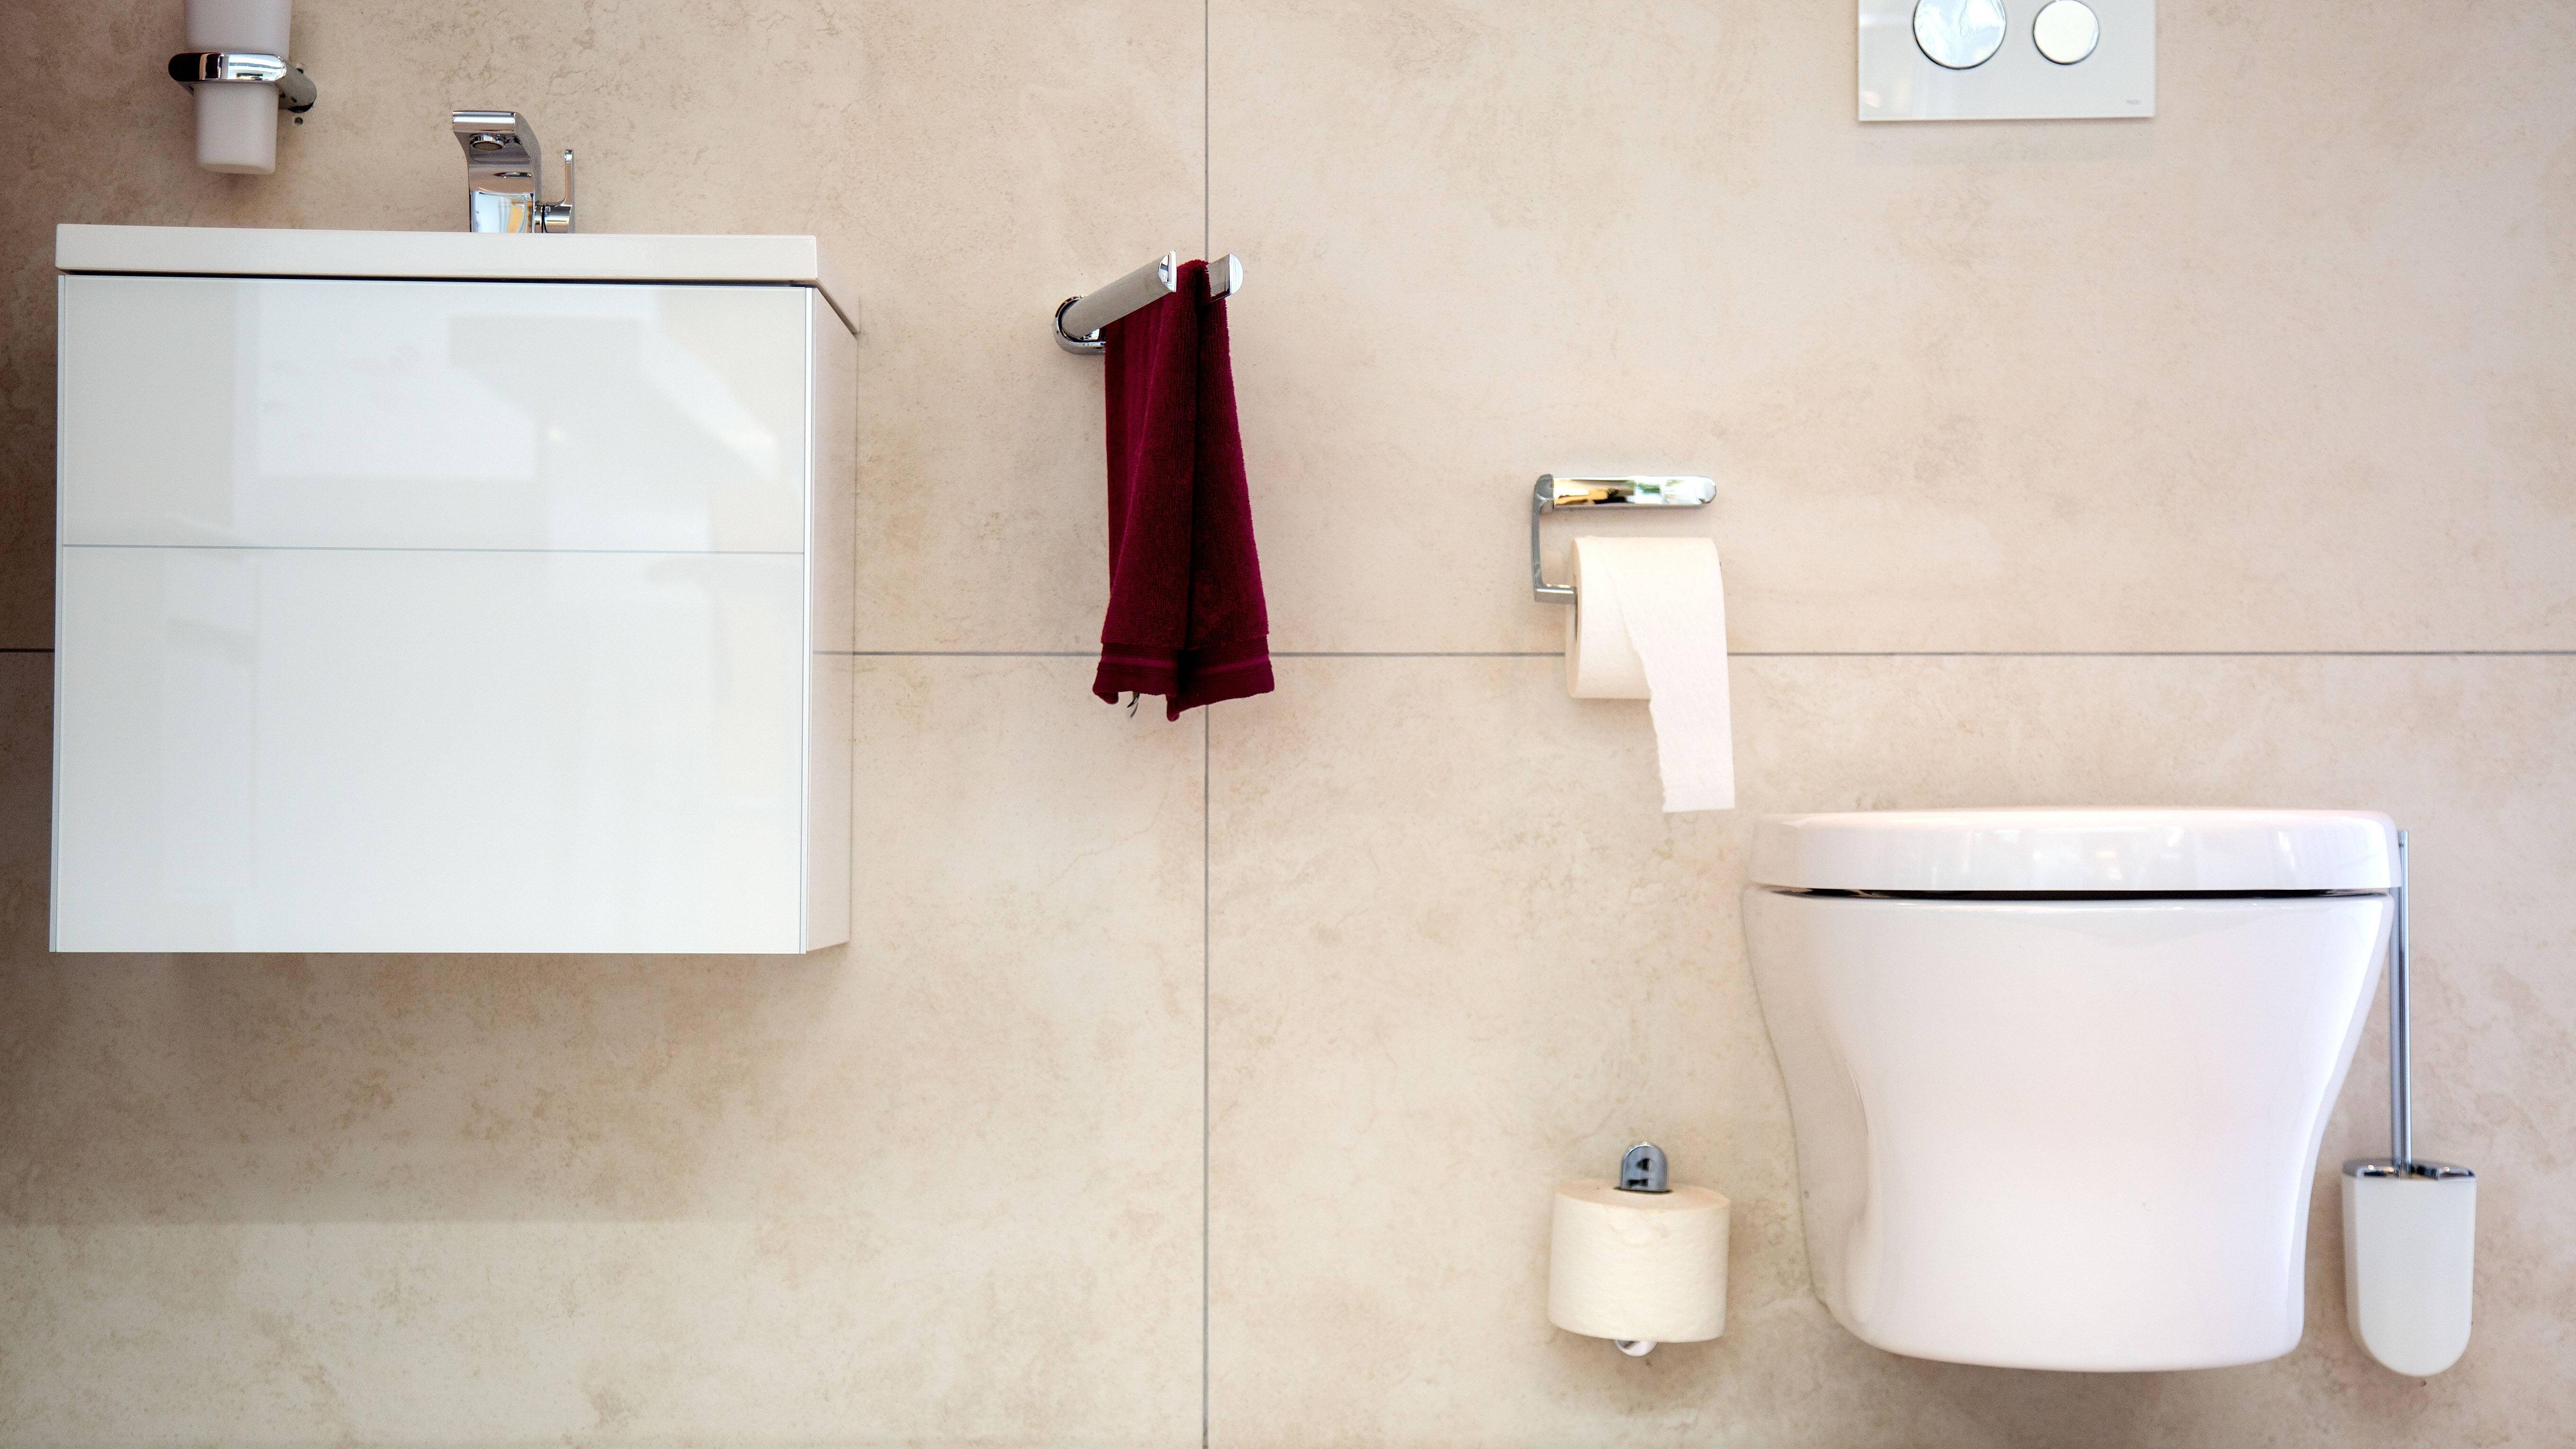 Toilette entkalken: So geht's richtig